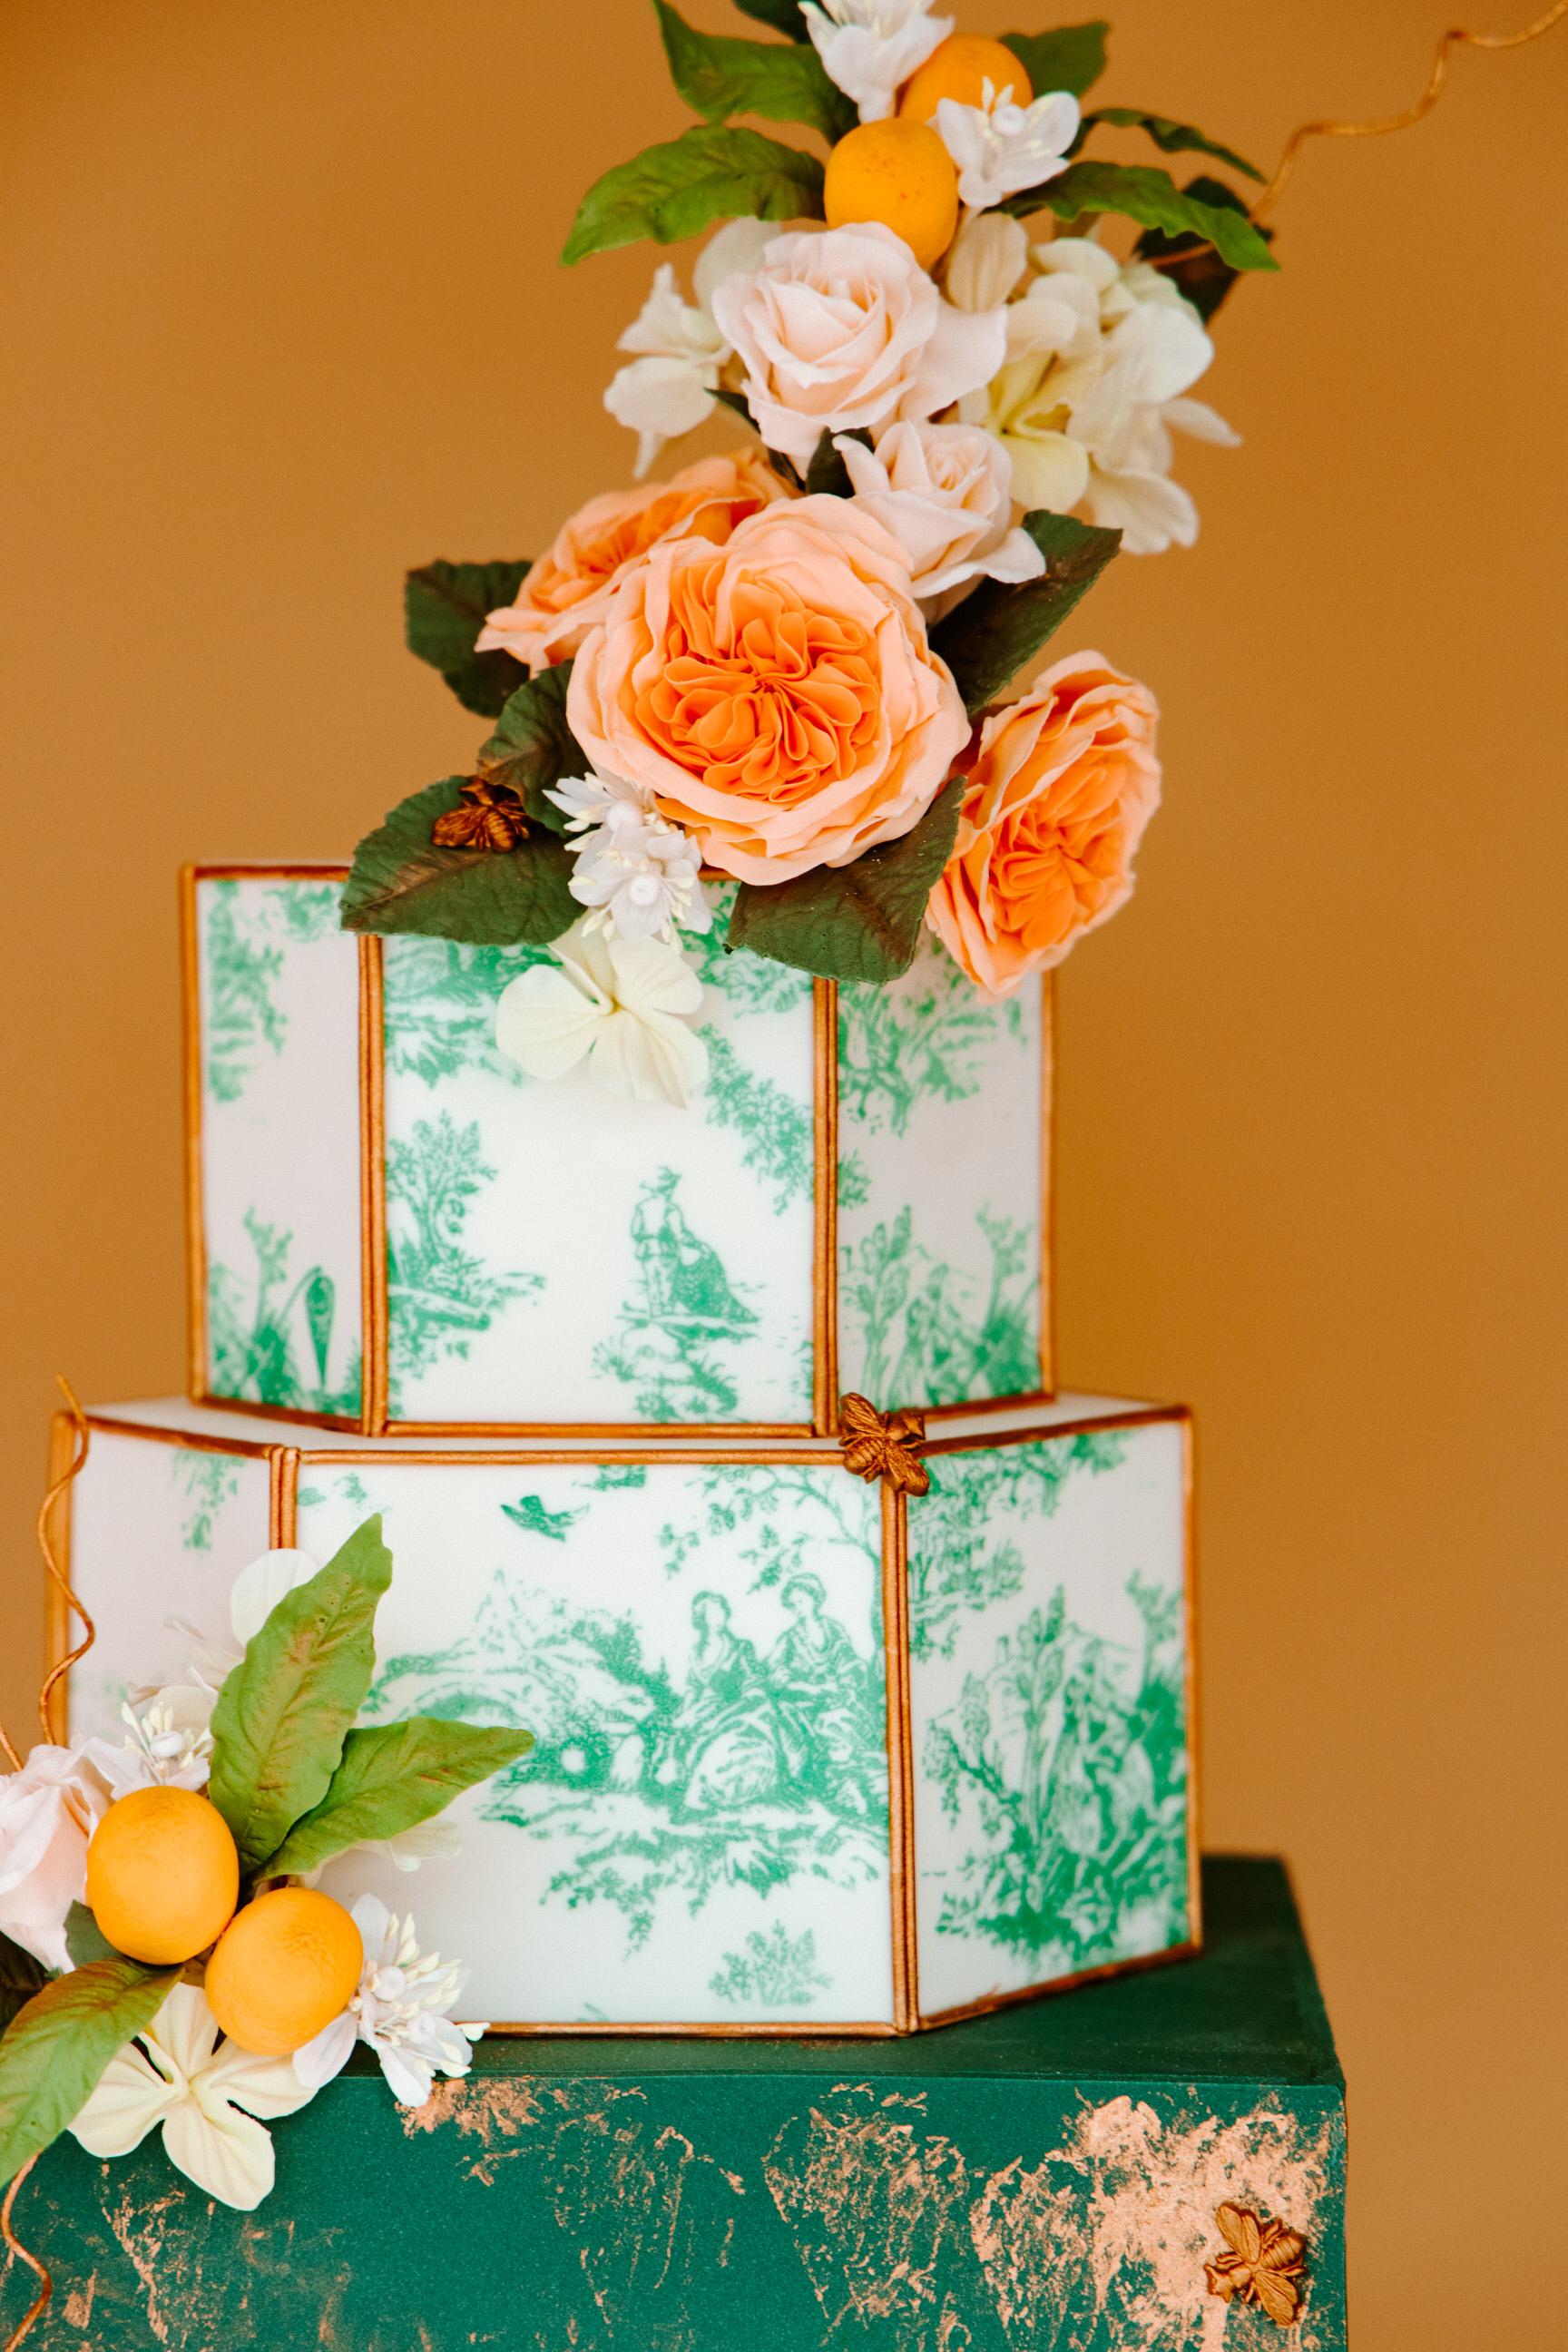 gateaux-cake-7391.jpg